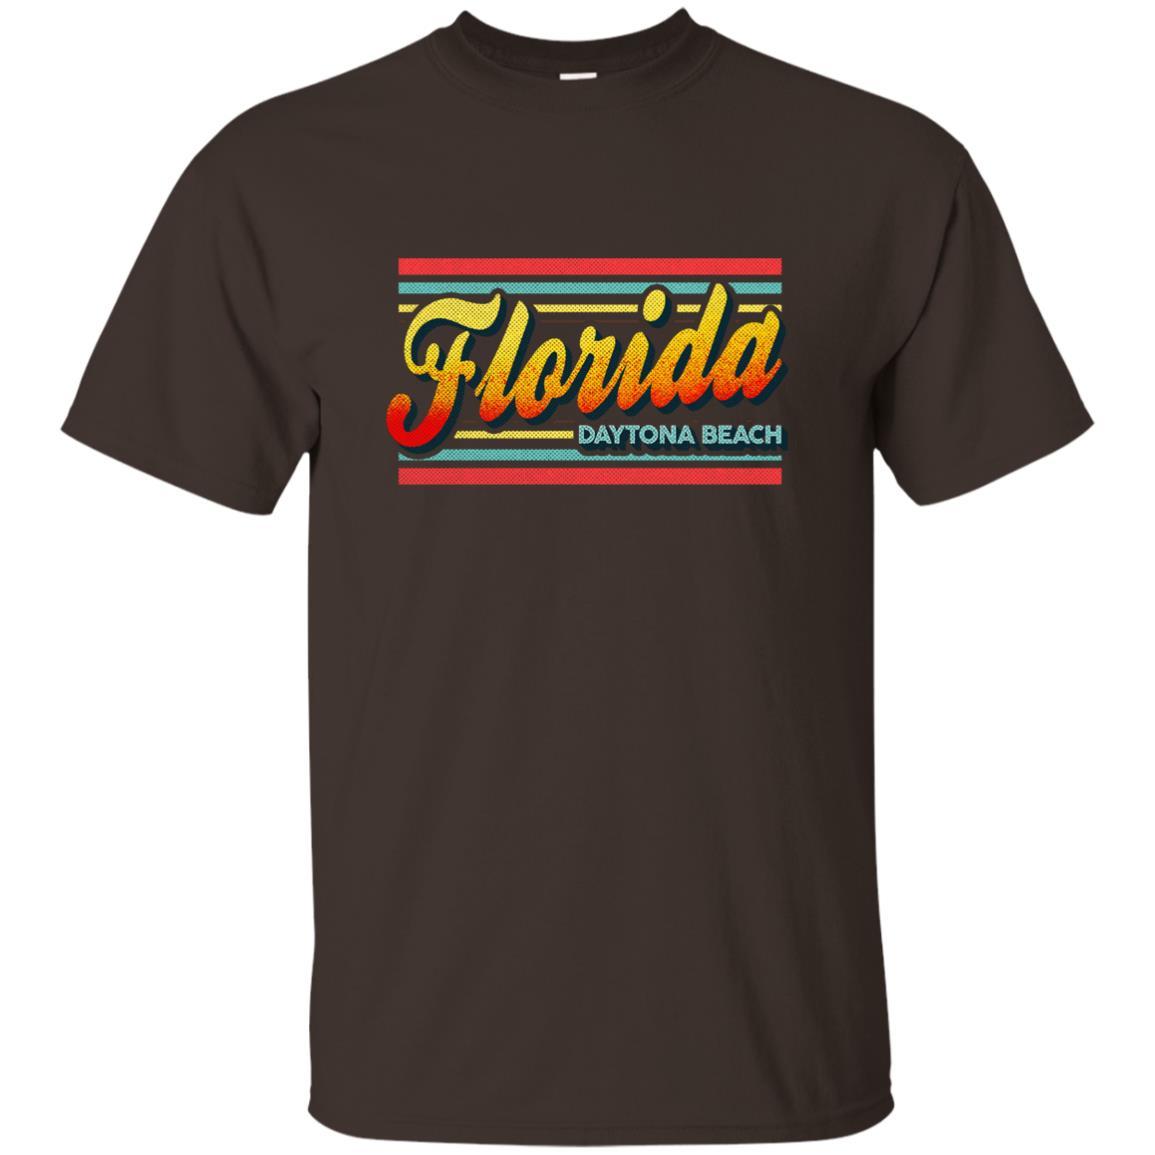 Daytona Beach Florida Retro Vintage 80s Unisex Short Sleeve